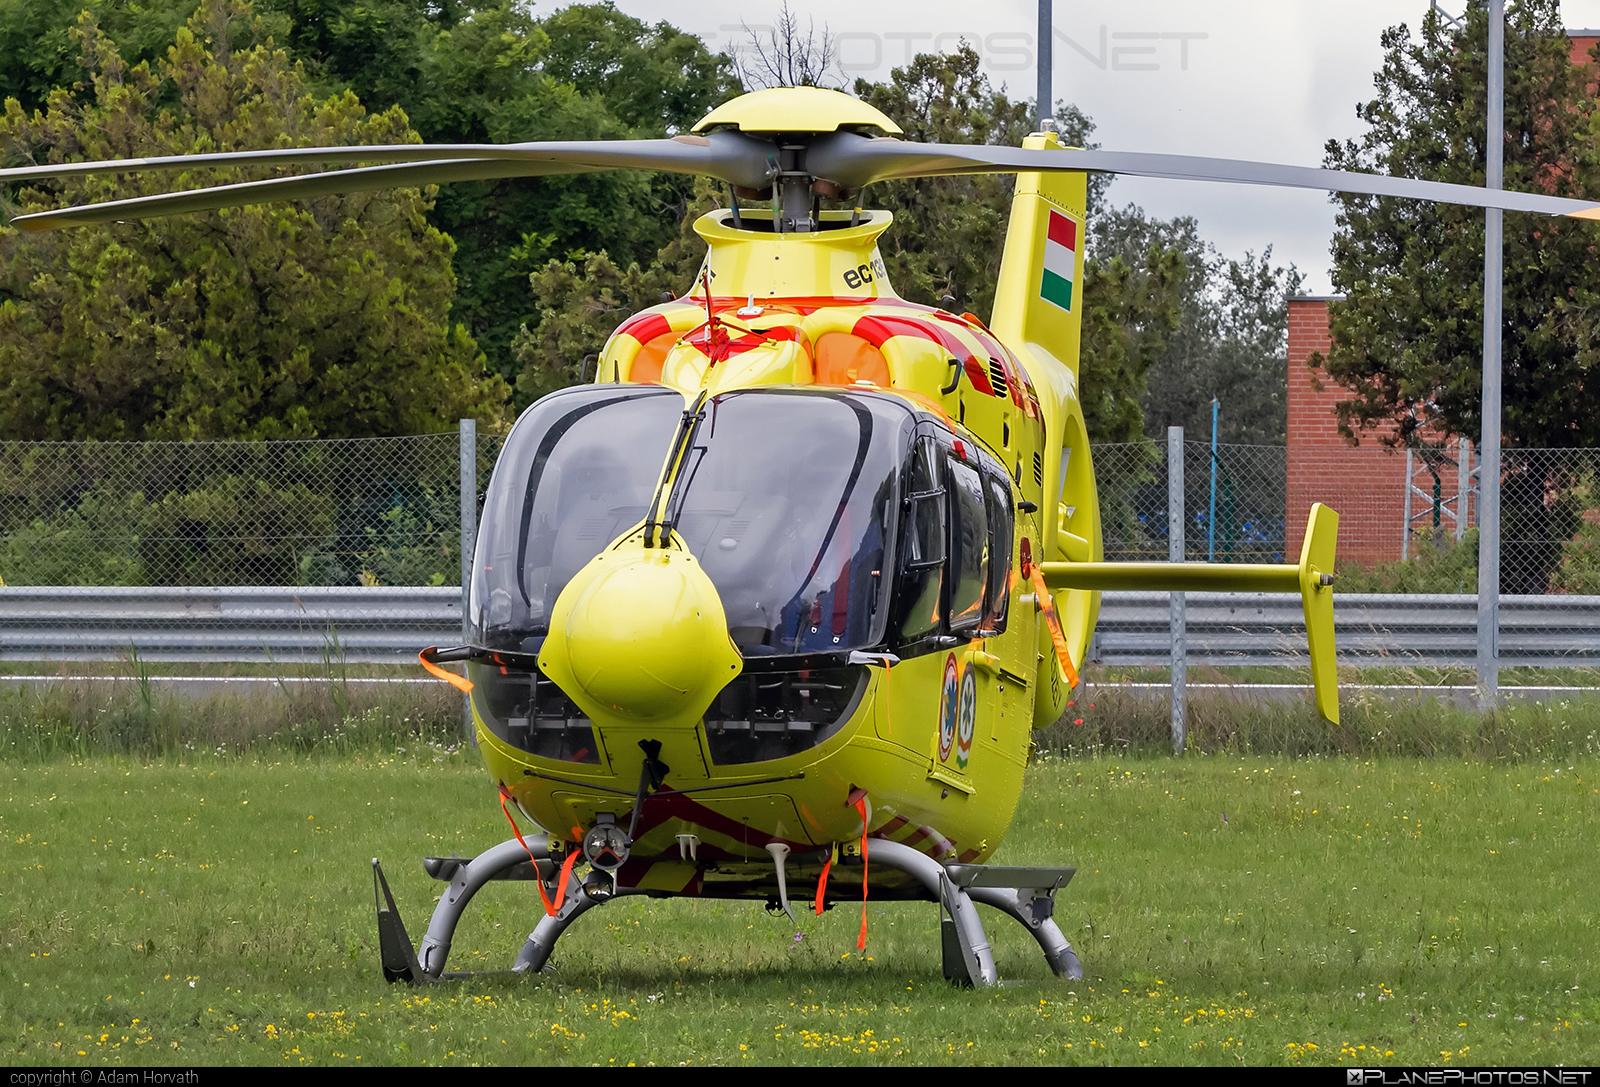 Eurocopter EC135 P2+ - HA-HBO operated by Magyar Légimentő Nonprofit (Hungarian Air Ambulance) #ec135 #ec135p2 #ec135p2plus #eurocopter #hungarianairambulance #magyarlegimentononprofit